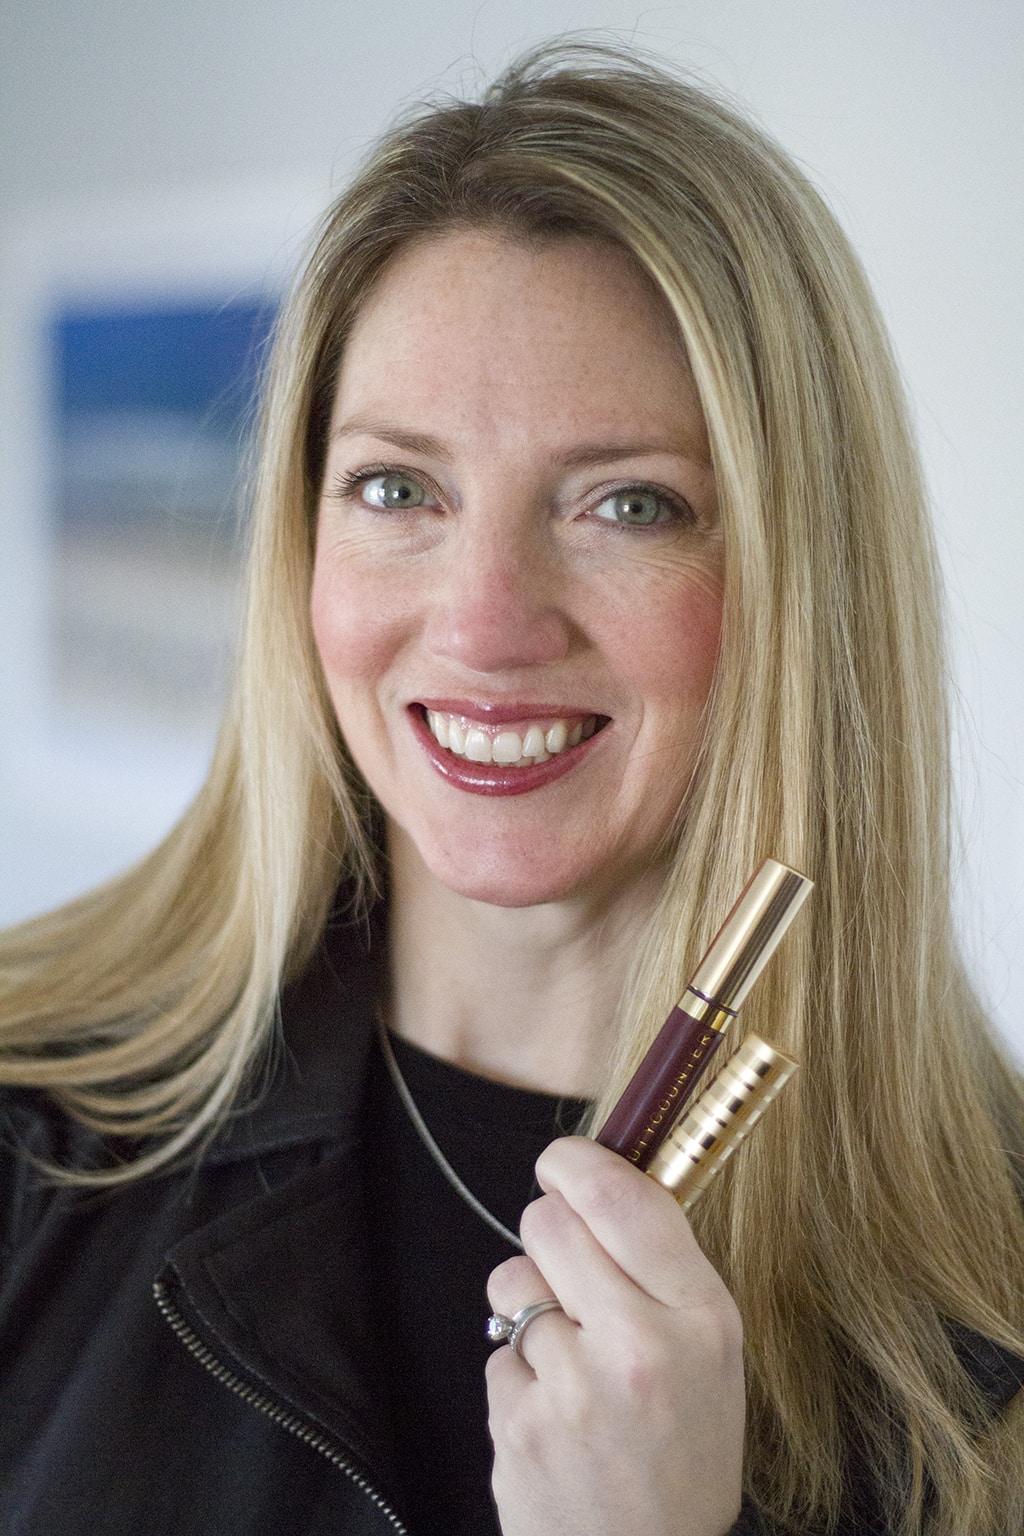 Testing Beautycounter Makeup